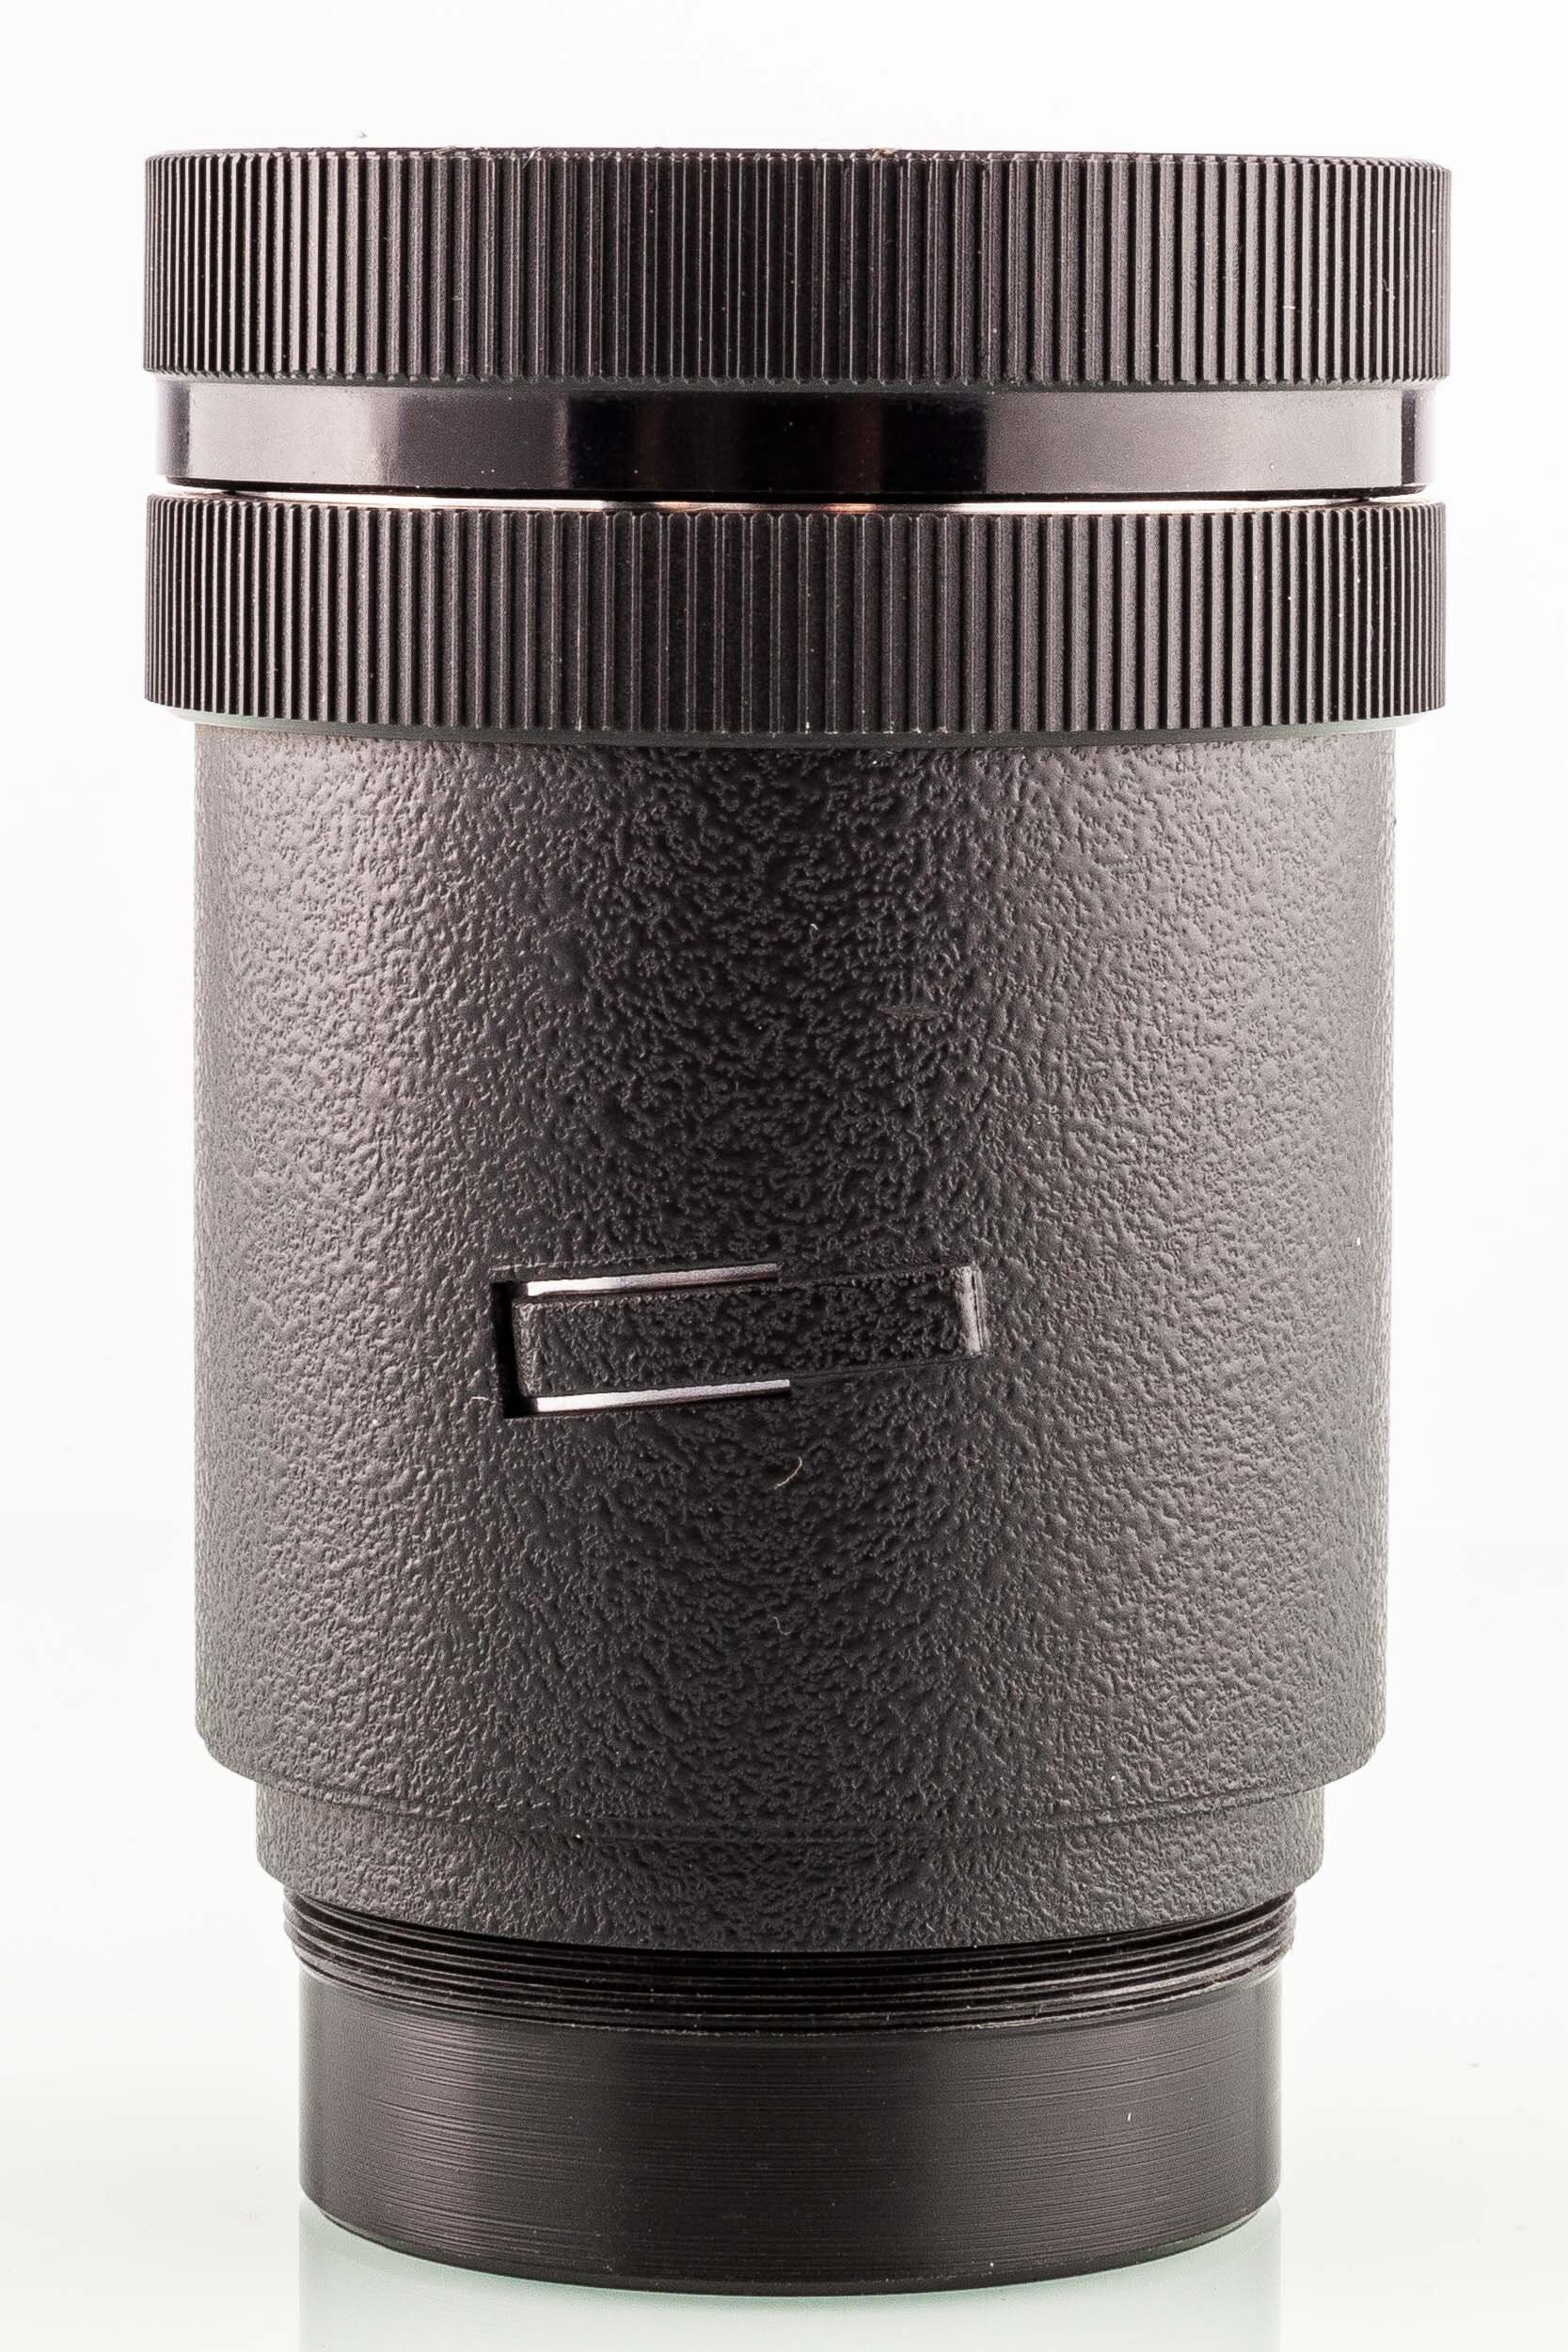 Leitz Wetzlar Elmaron 2,8/150mm Projektionsobjektiv